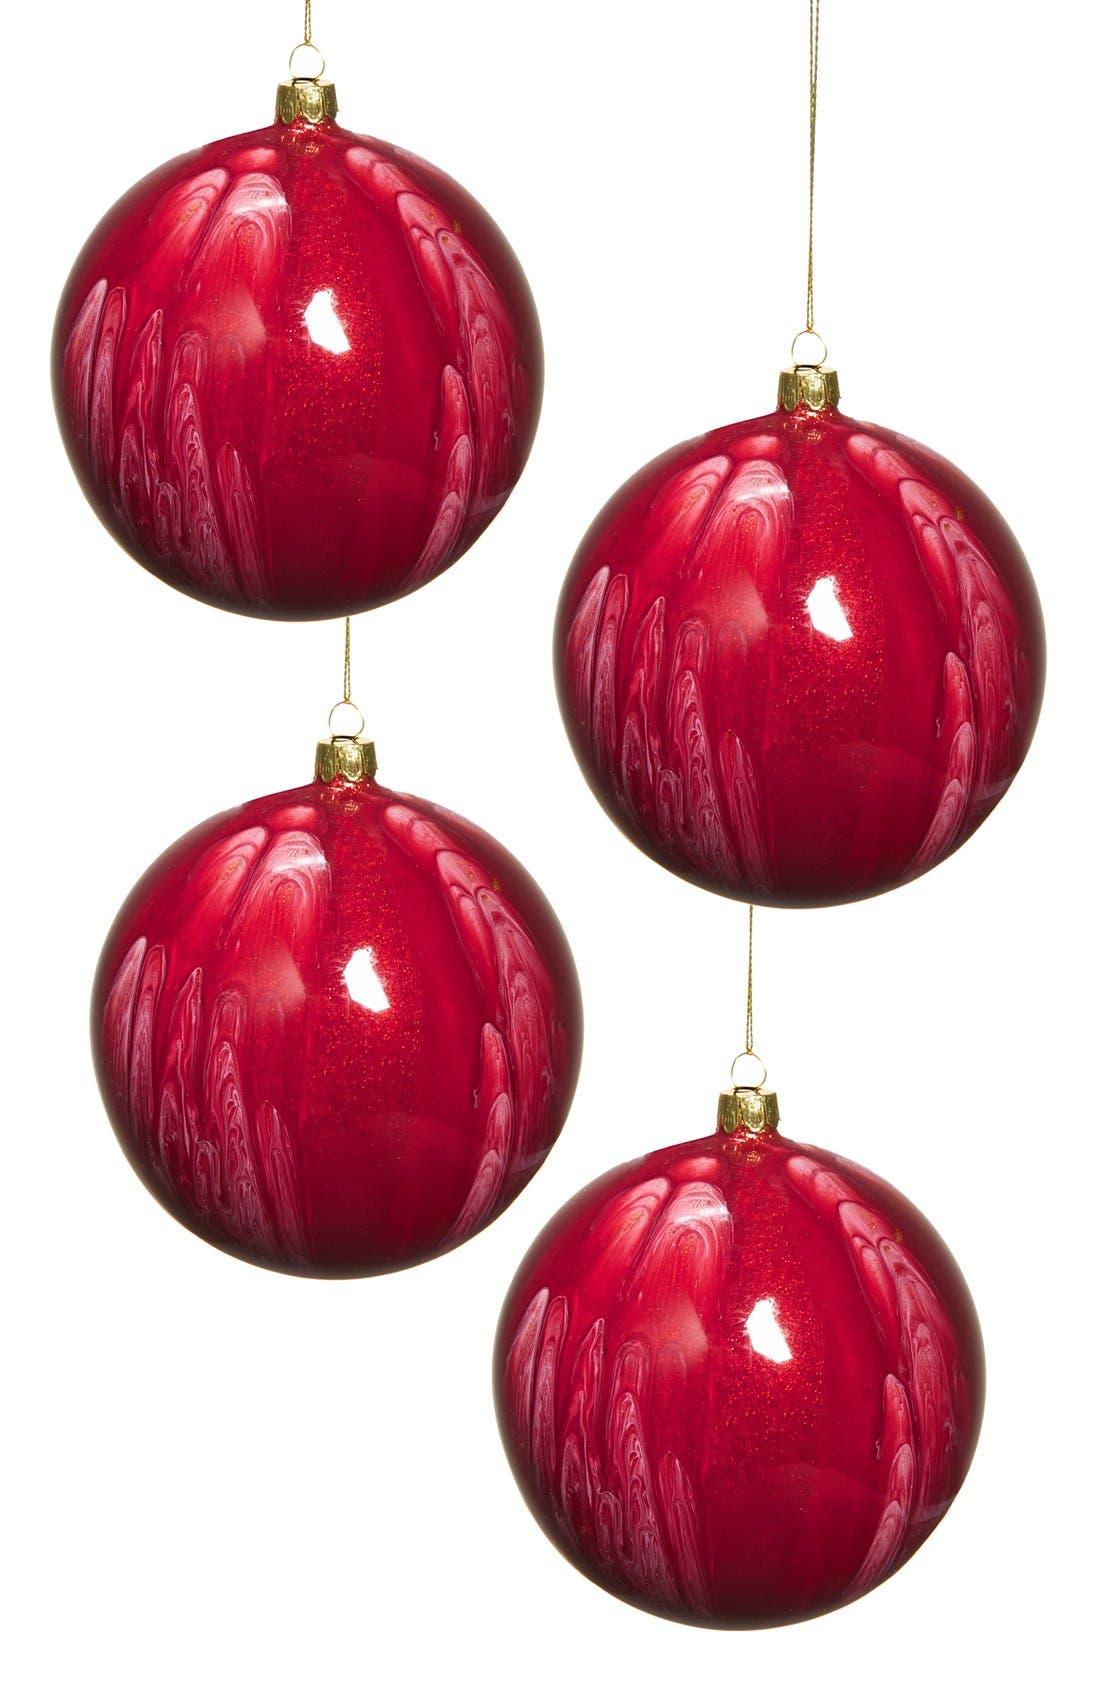 Alternate Image 1 Selected - Jim Marvin 'Malachite' Glass Ball Ornaments (Set of 4)